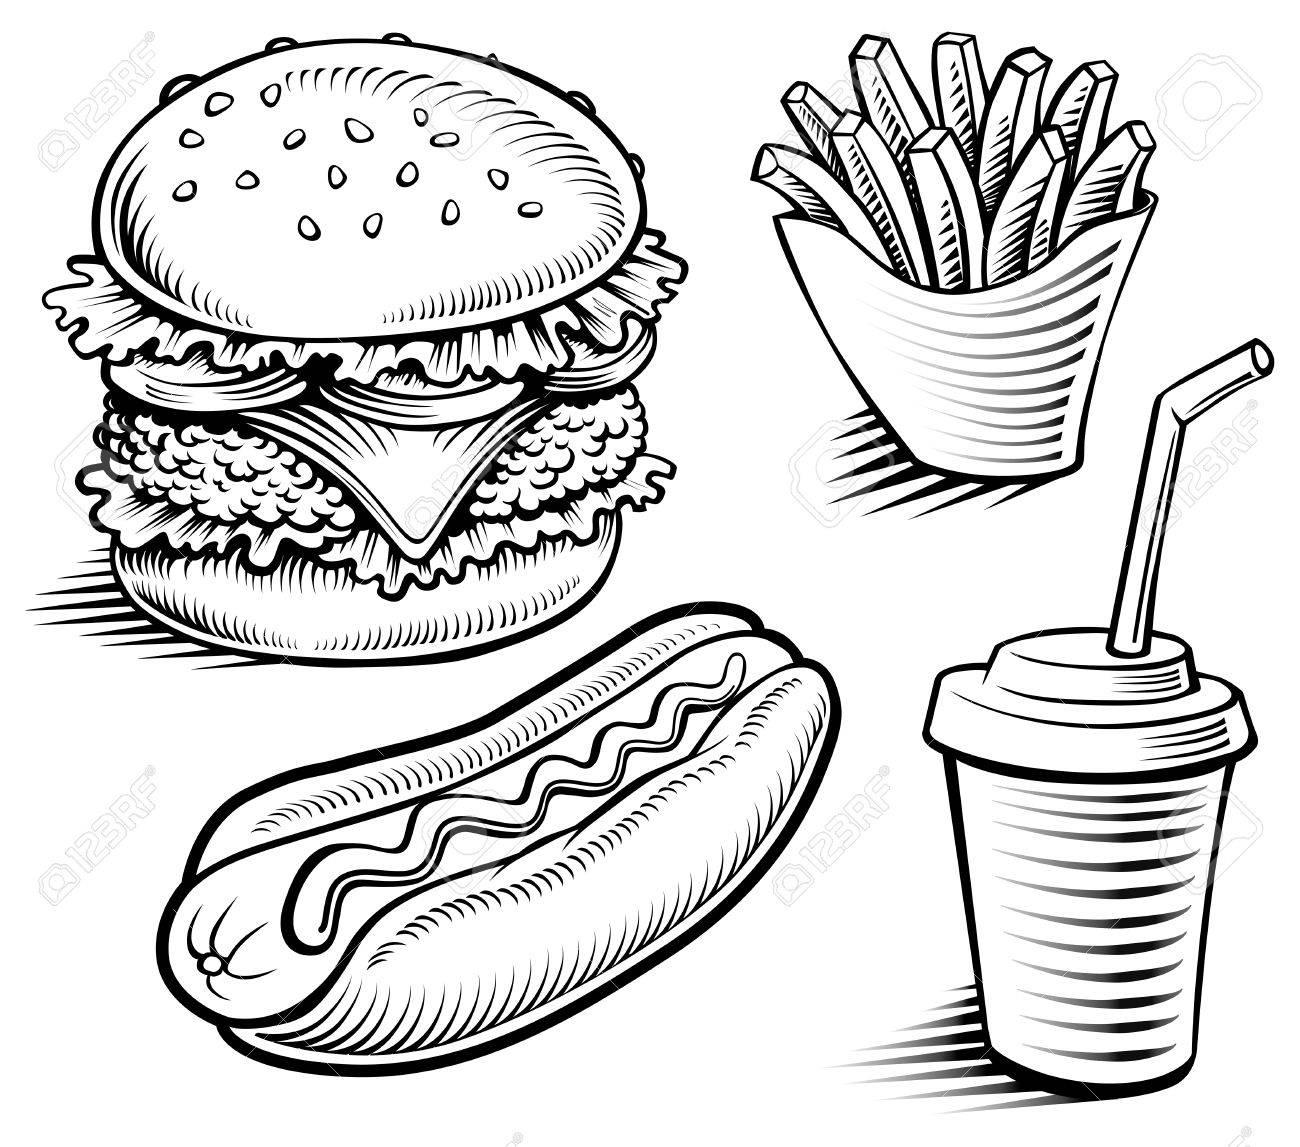 Meal Drawing At Getdrawings